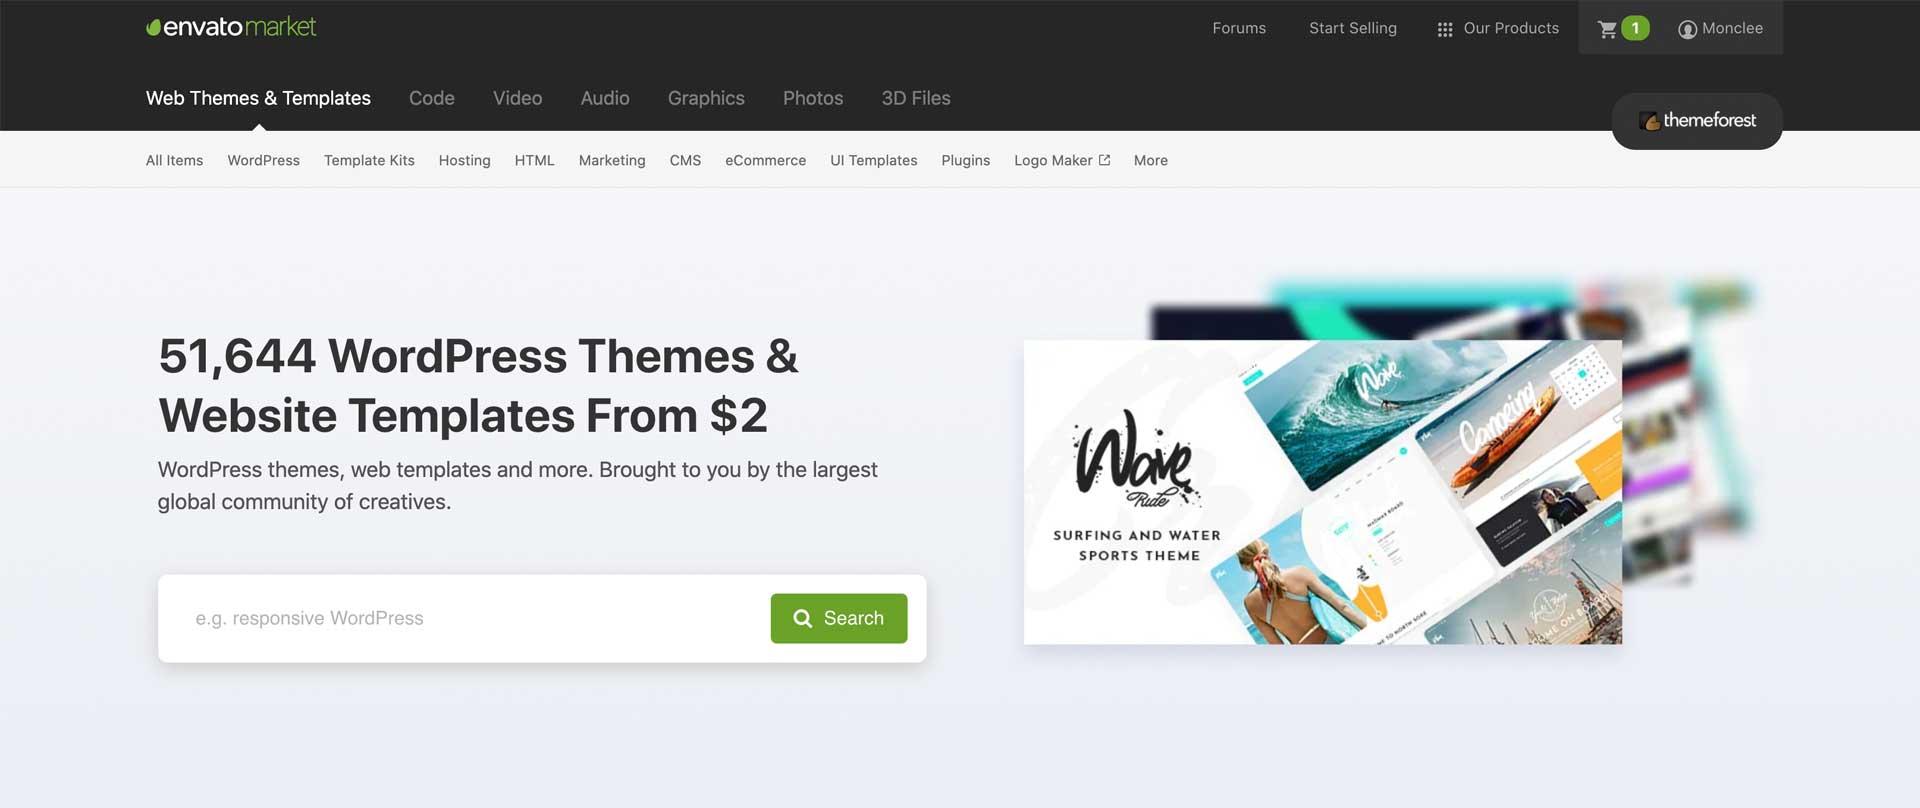 Themeforest.net - Guía para WordPress 2021